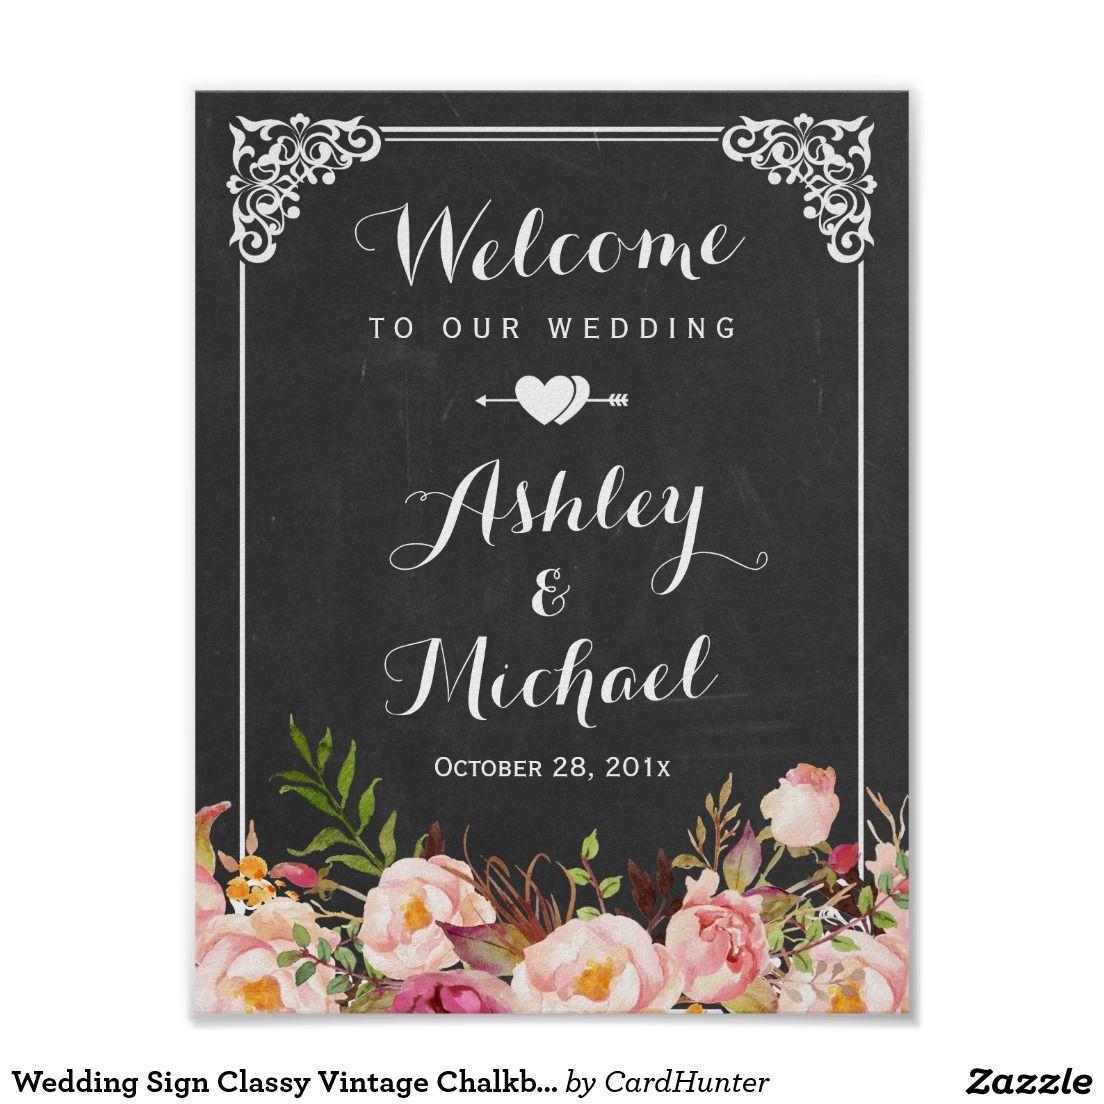 Wedding Sign Classy Vintage Chalkboard Floral | Wedding and ...